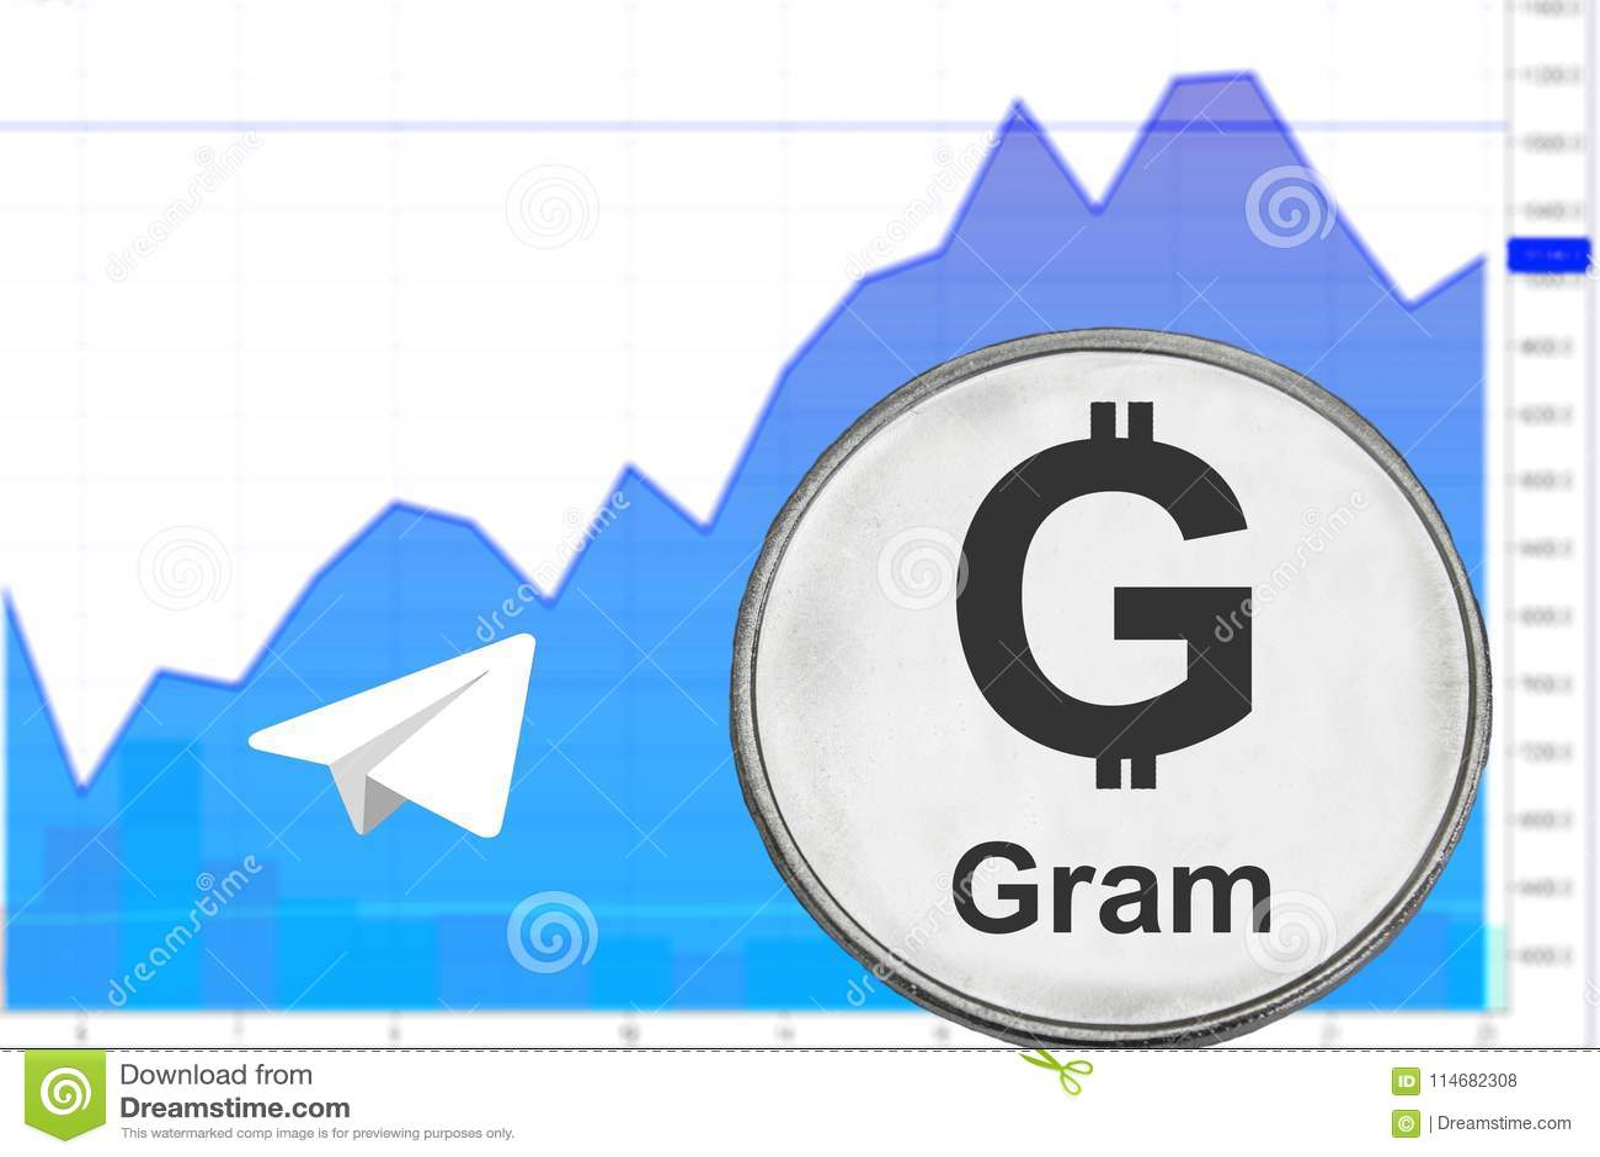 Telegram (software) - Wikipedia